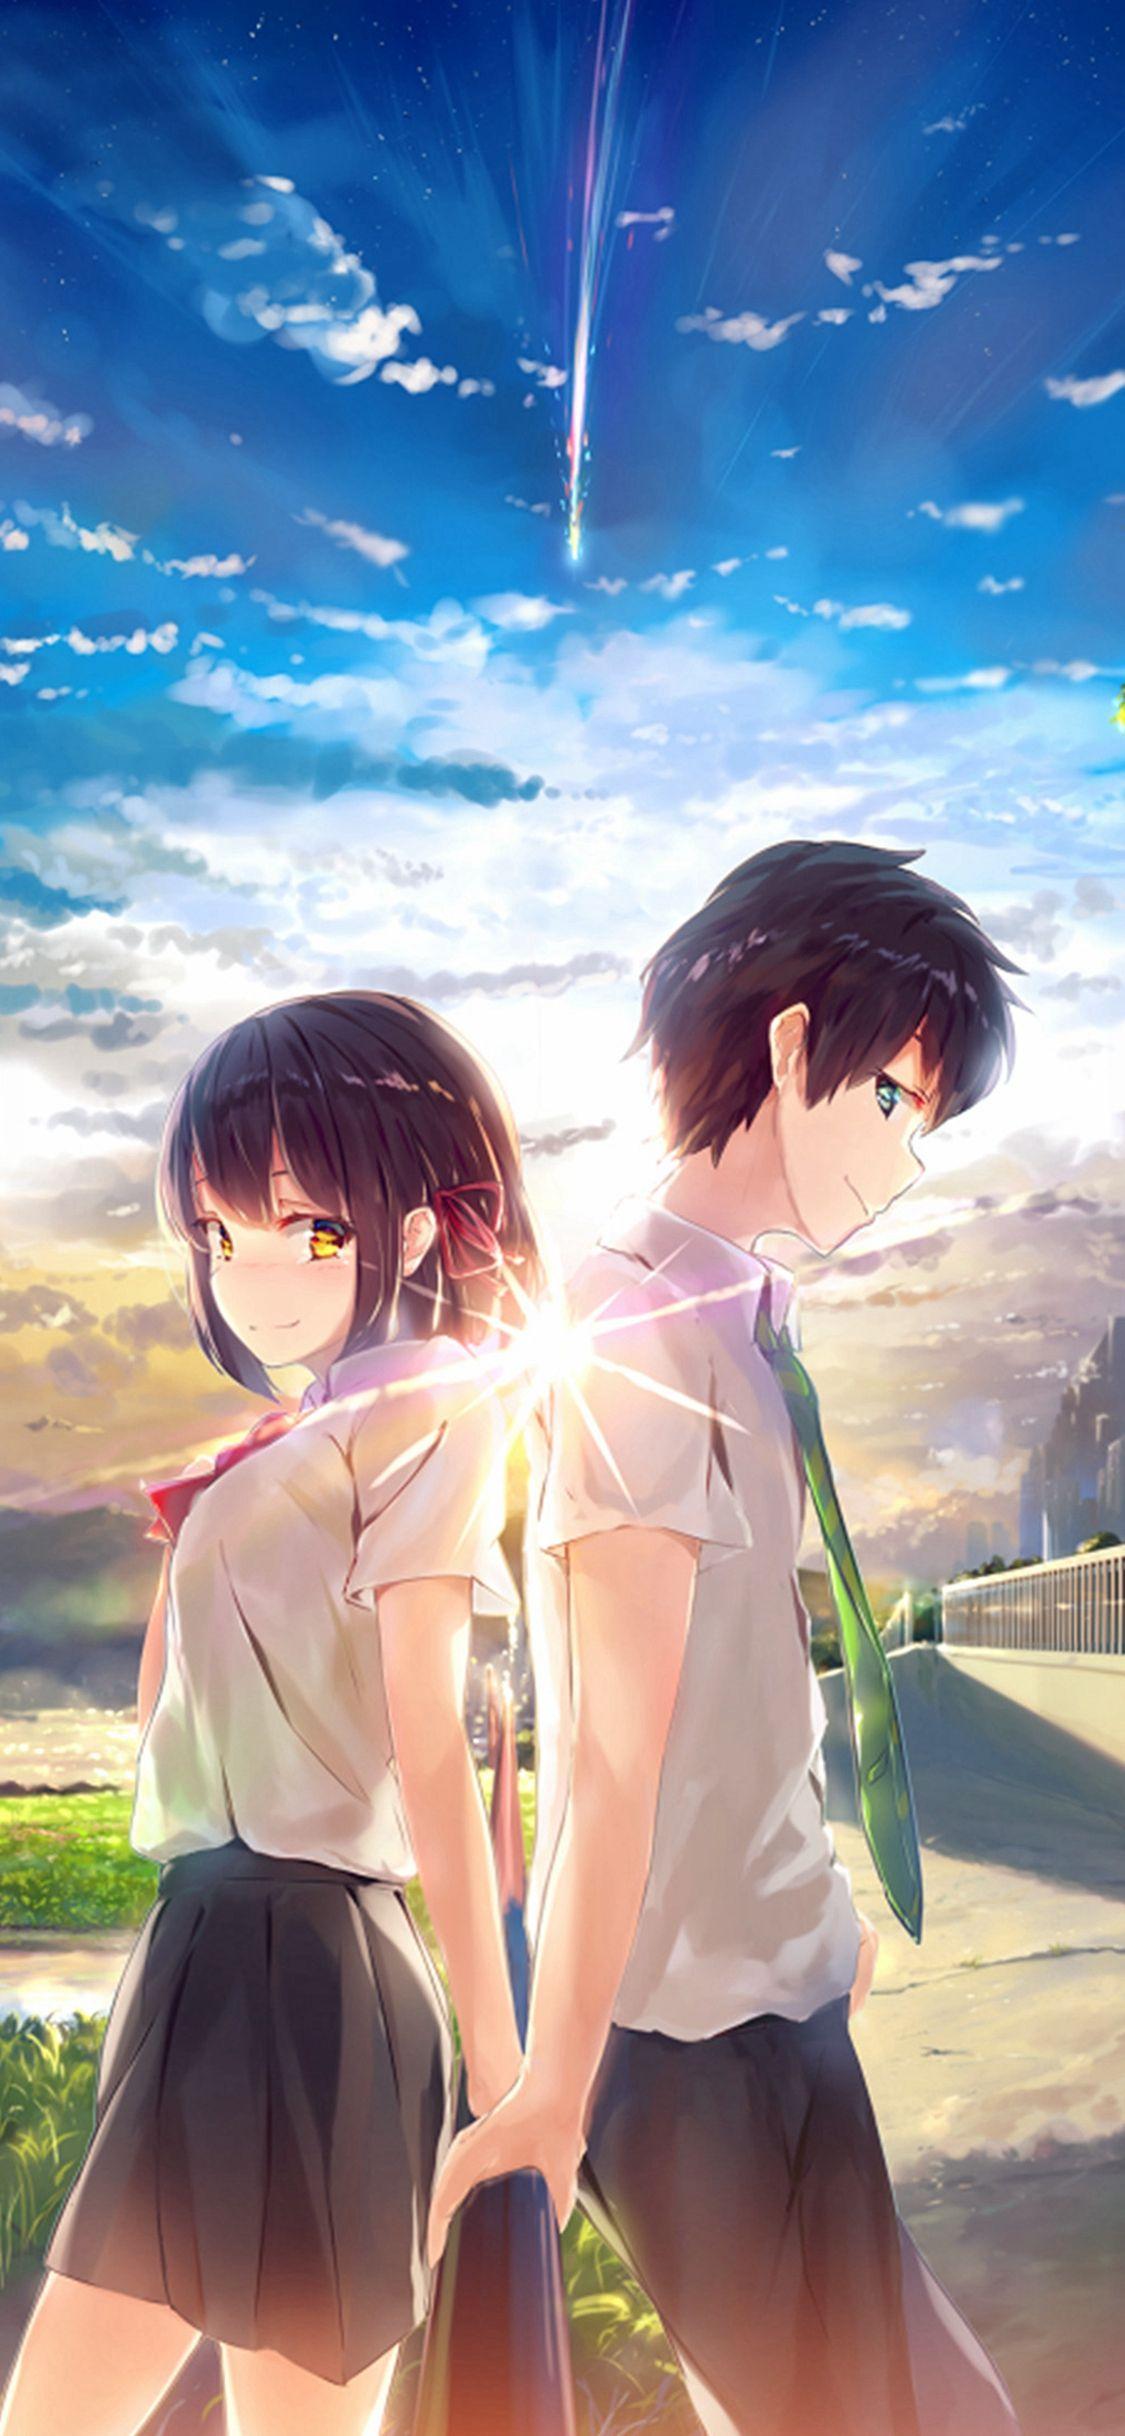 Anime Yourname Sky Illustration Art IPhone X Wallpaper